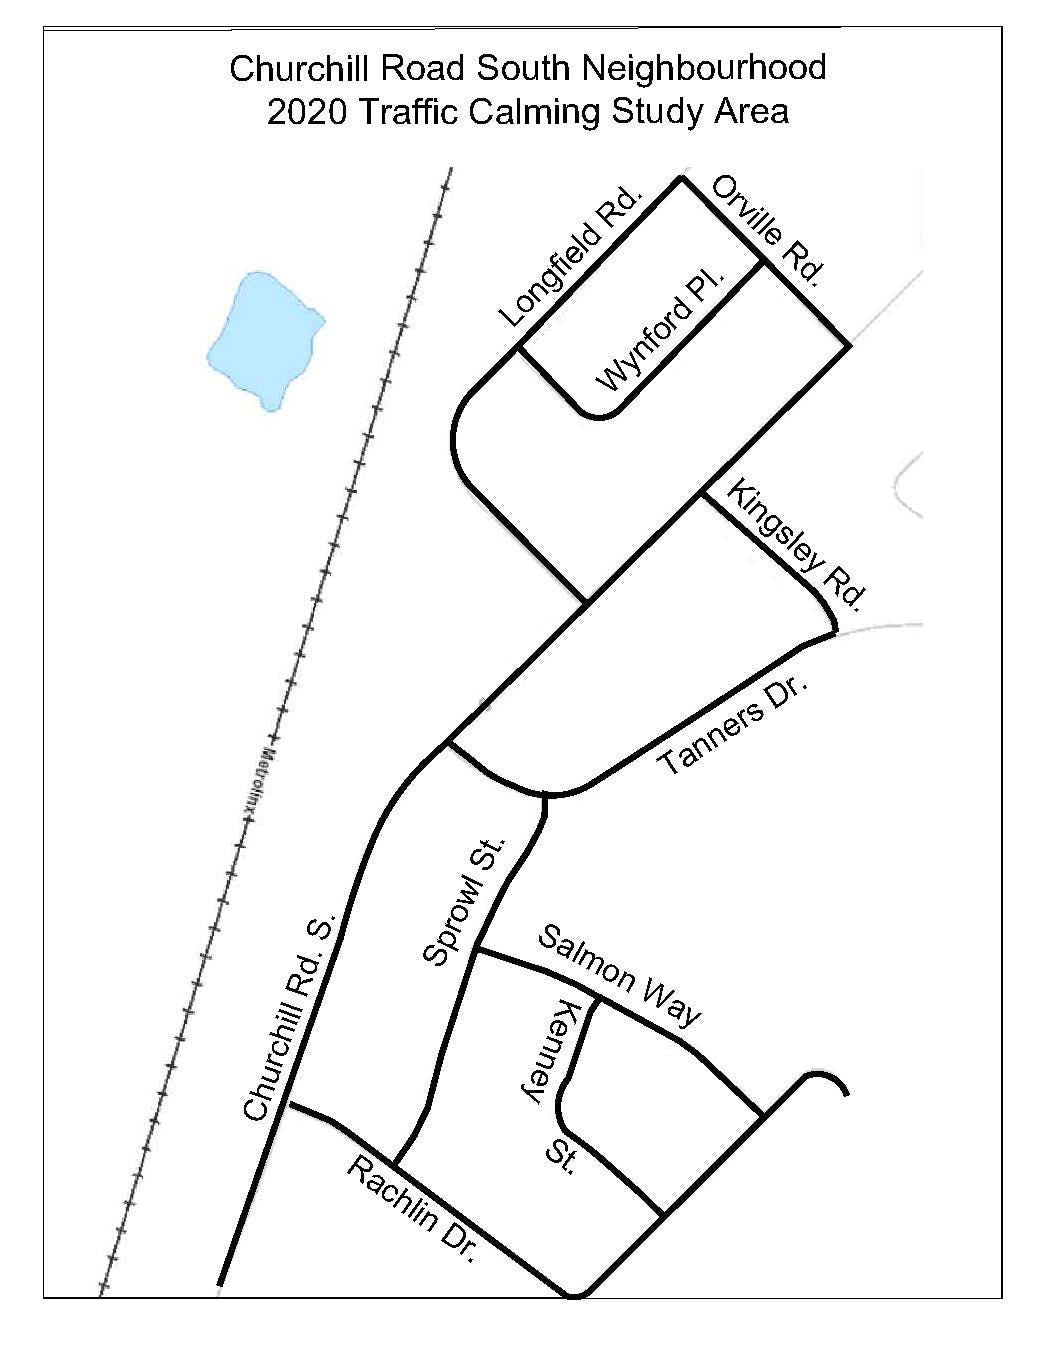 Churchill Rd S Traffic Calming Study Area.jpg